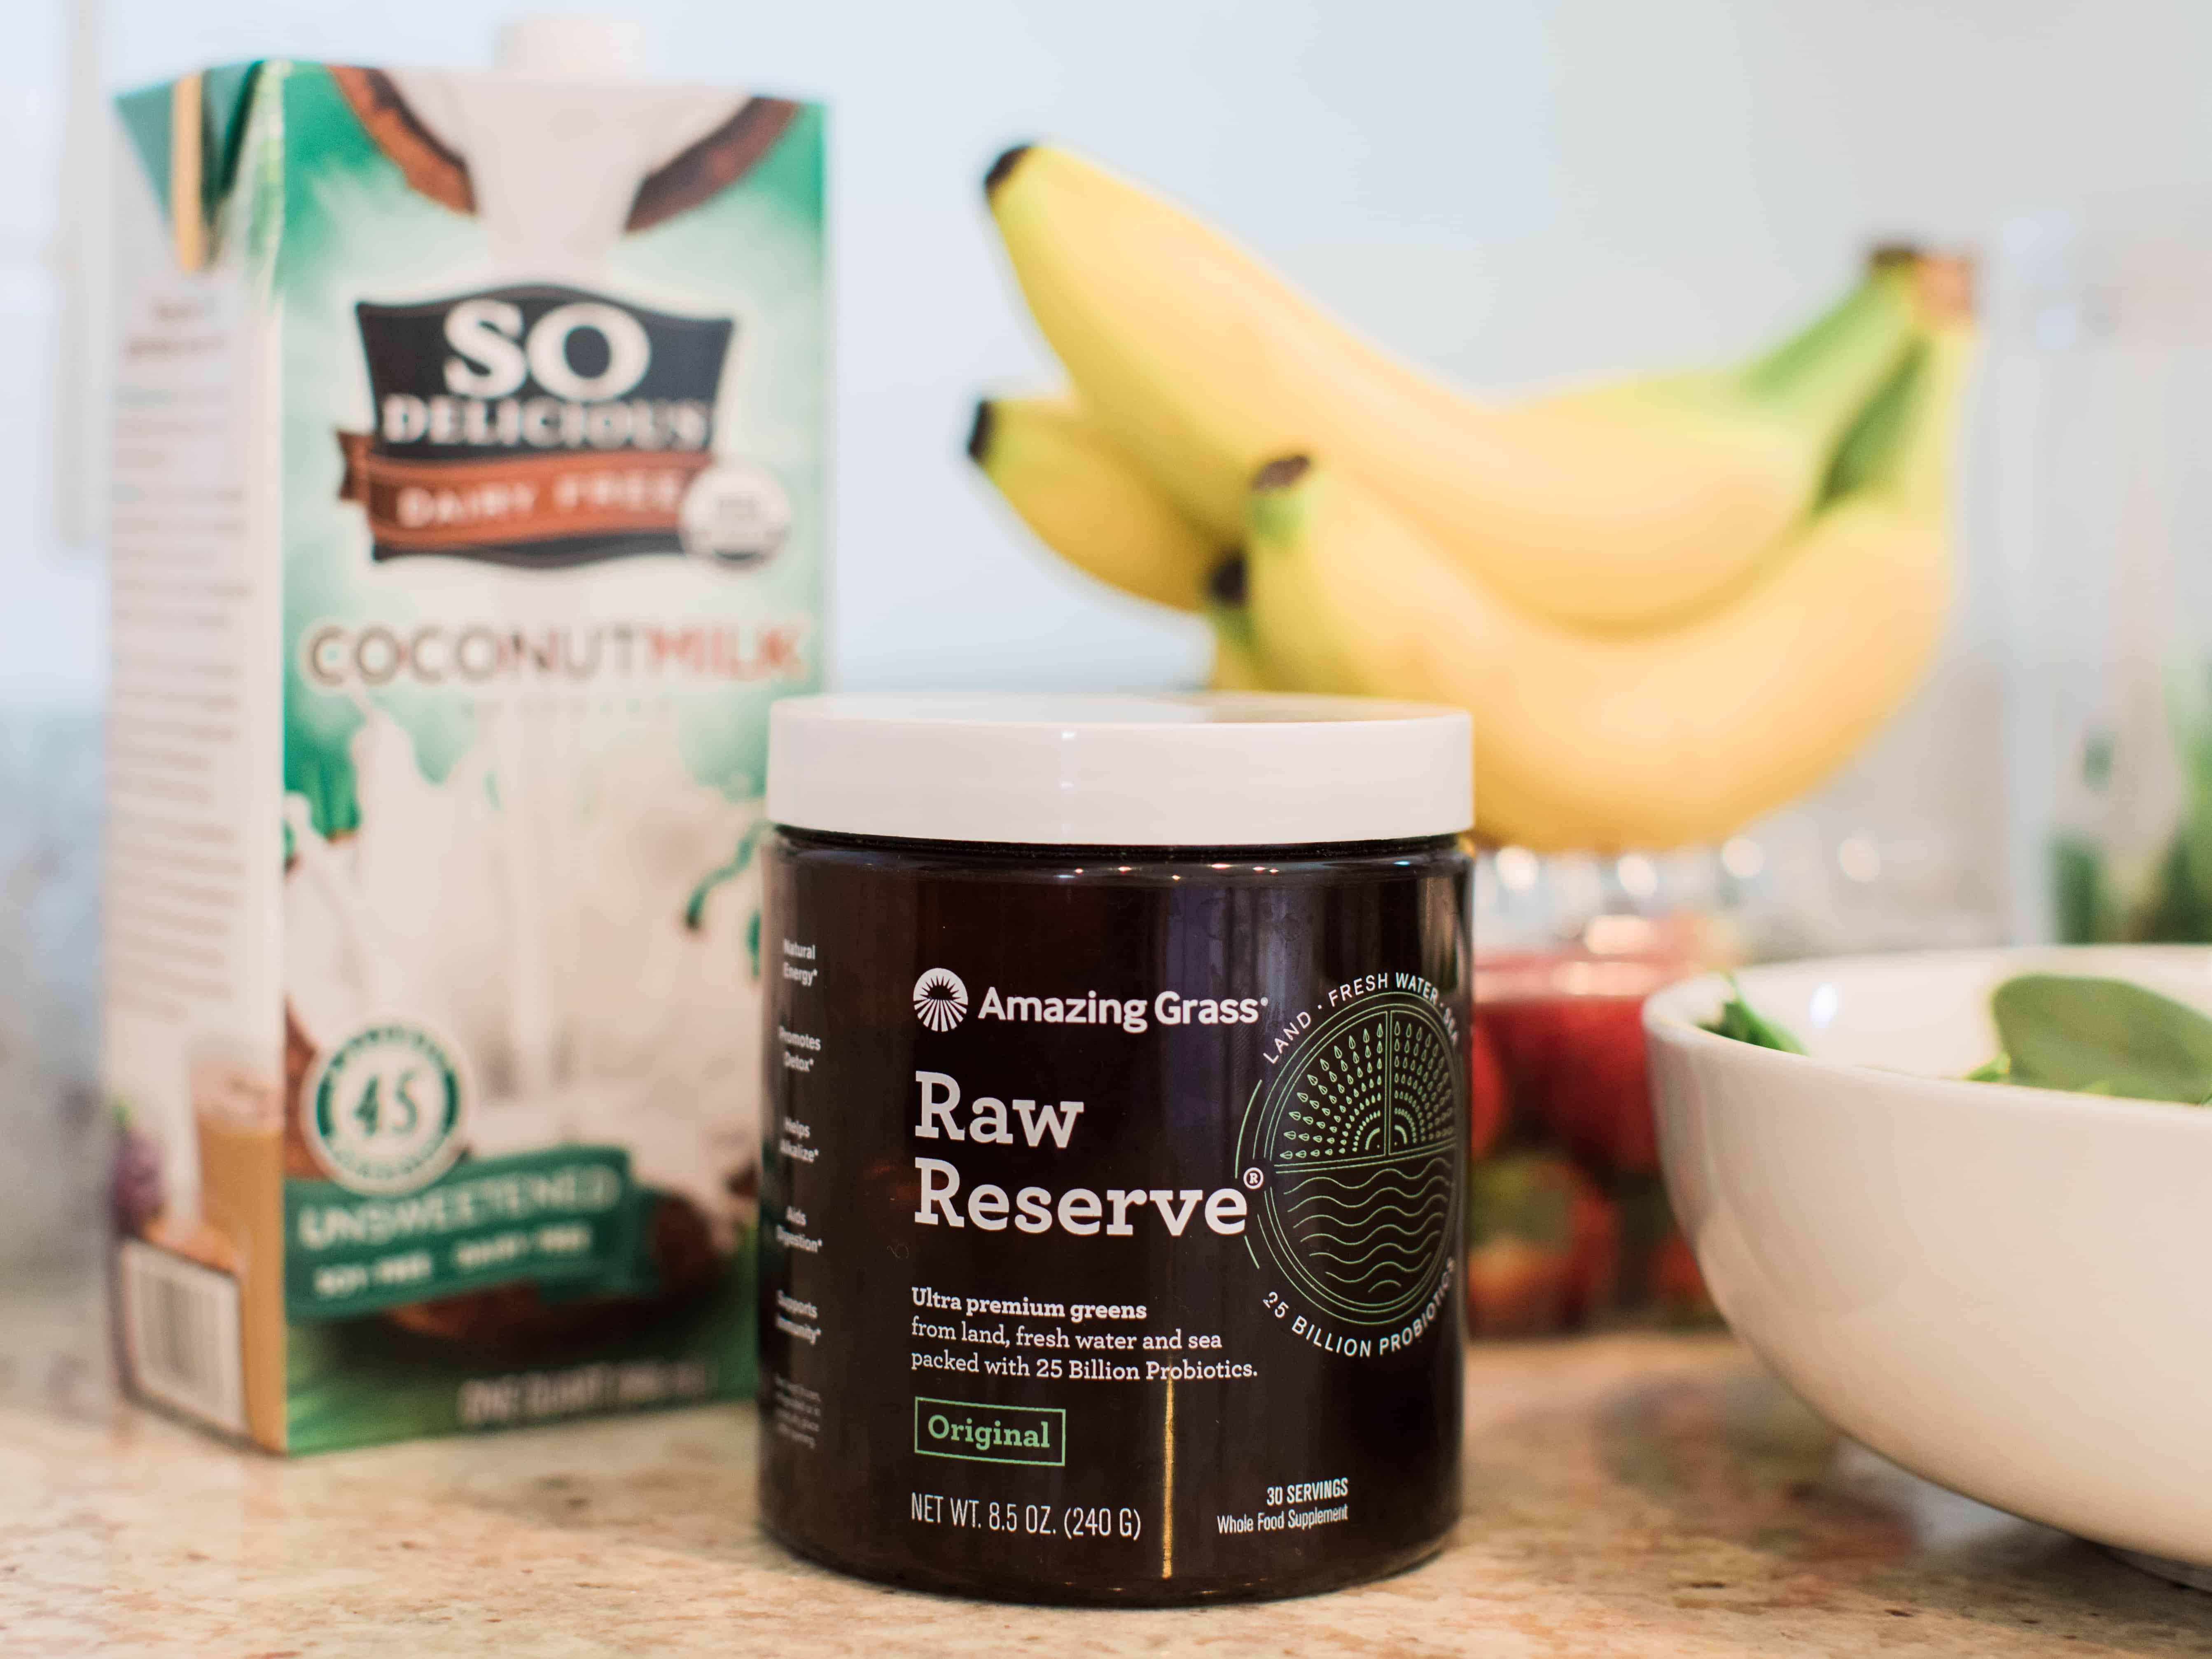 How to Incorporate More Veggies Into Your Diet #saveeandsavory #healthytips #amazinggrass #greenspowder #eatmoreveggies